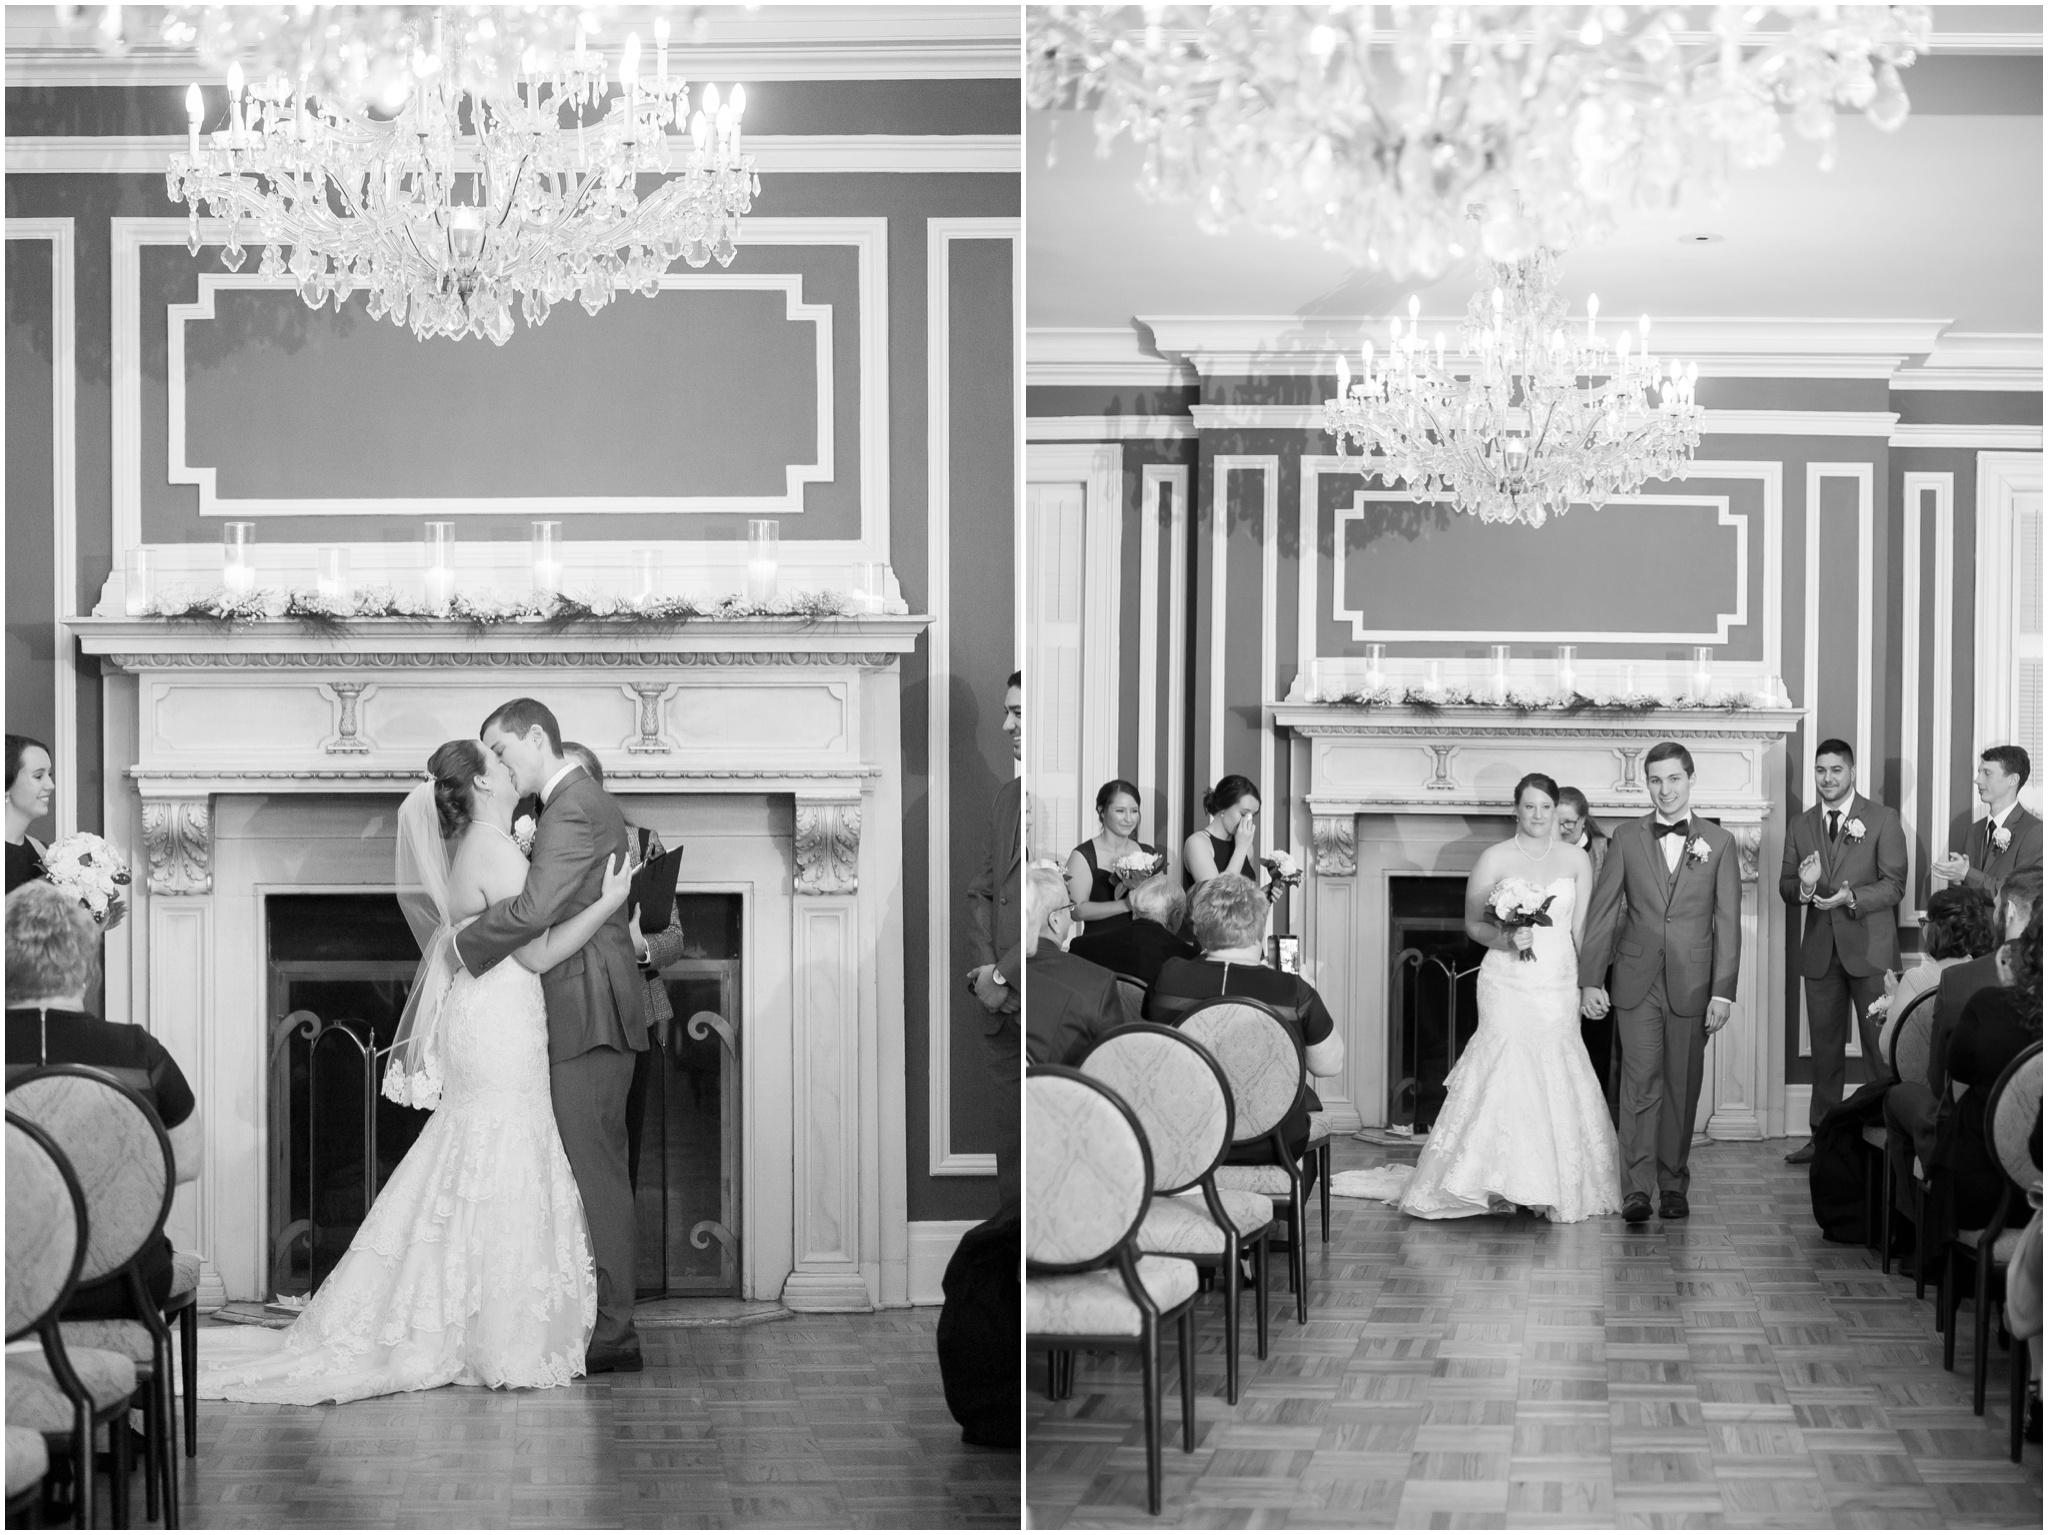 Madison_Club_Madison_Wisconsin_Wedding_Photographer_Spring_Rainy_Wedding_2655.jpg